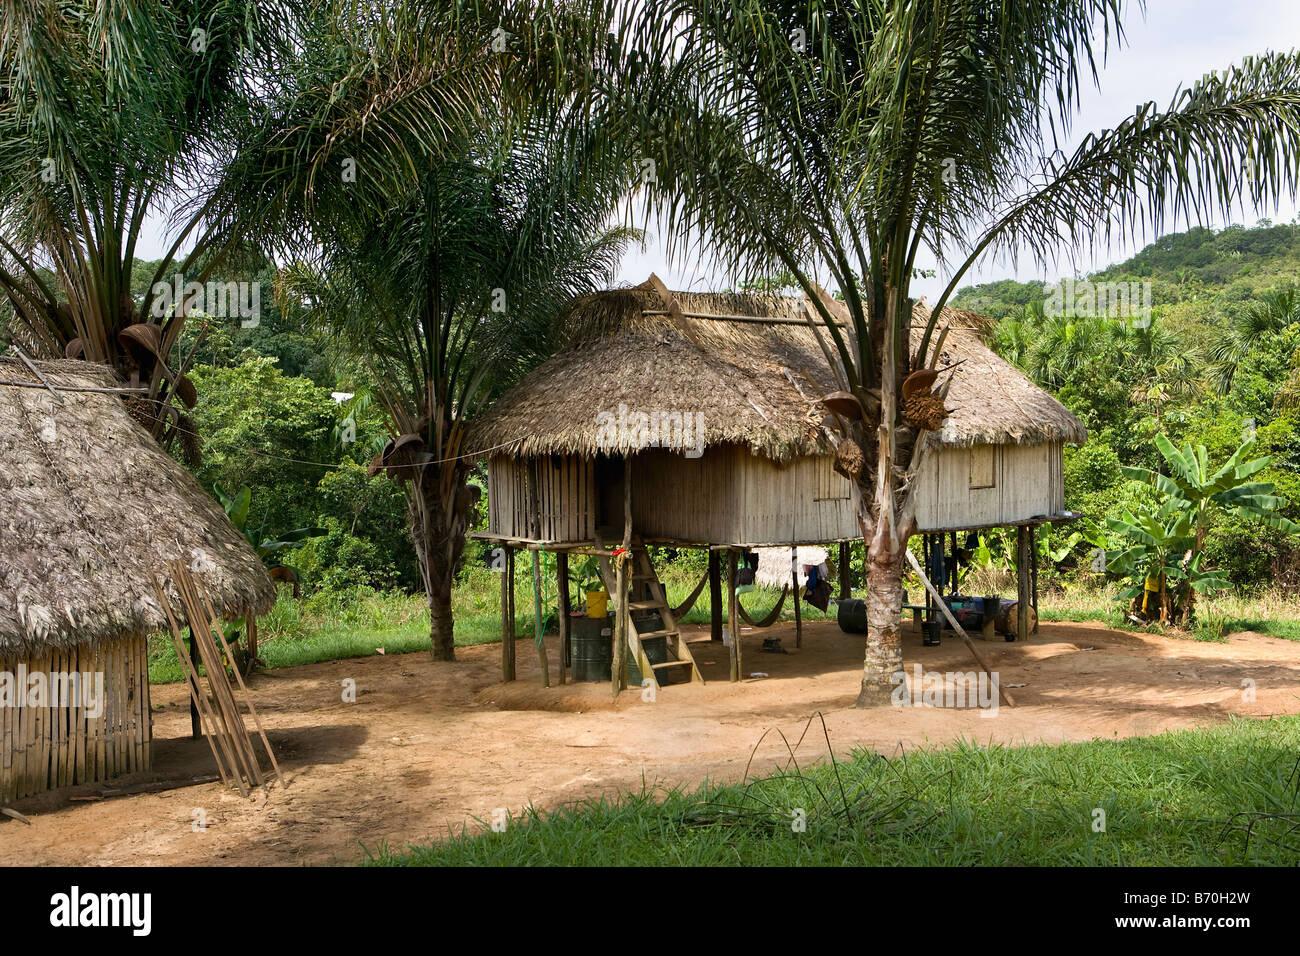 Suriname, Kwamalasamutu, home of indigenous Indians. Aerial. Huts on stilts. - Stock Image